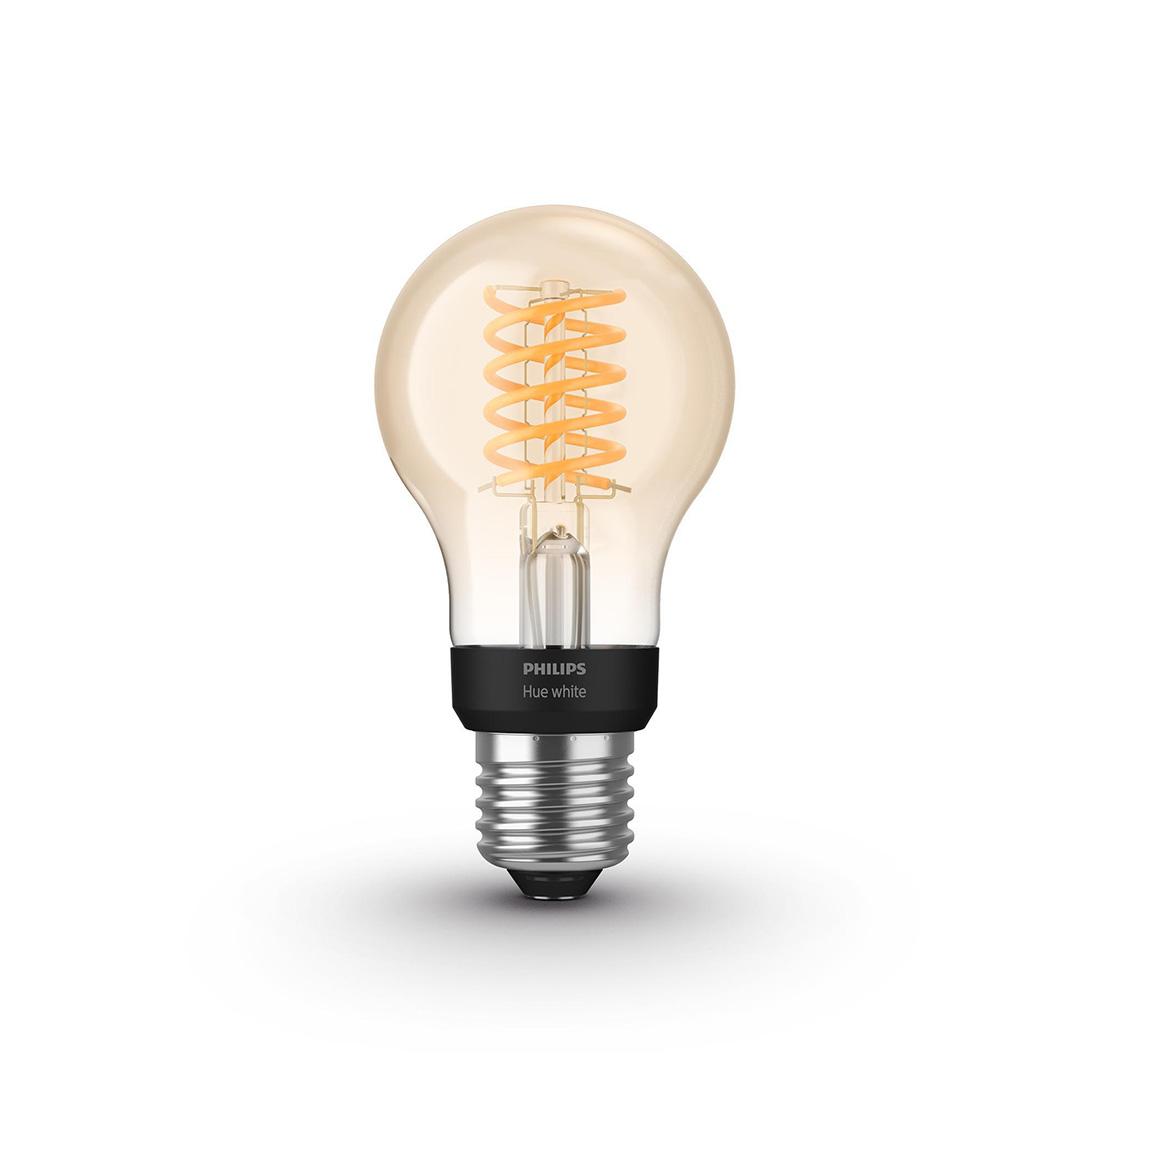 Philips Hue White Filament Standard E27 Bluetooth - Filament-Lampe